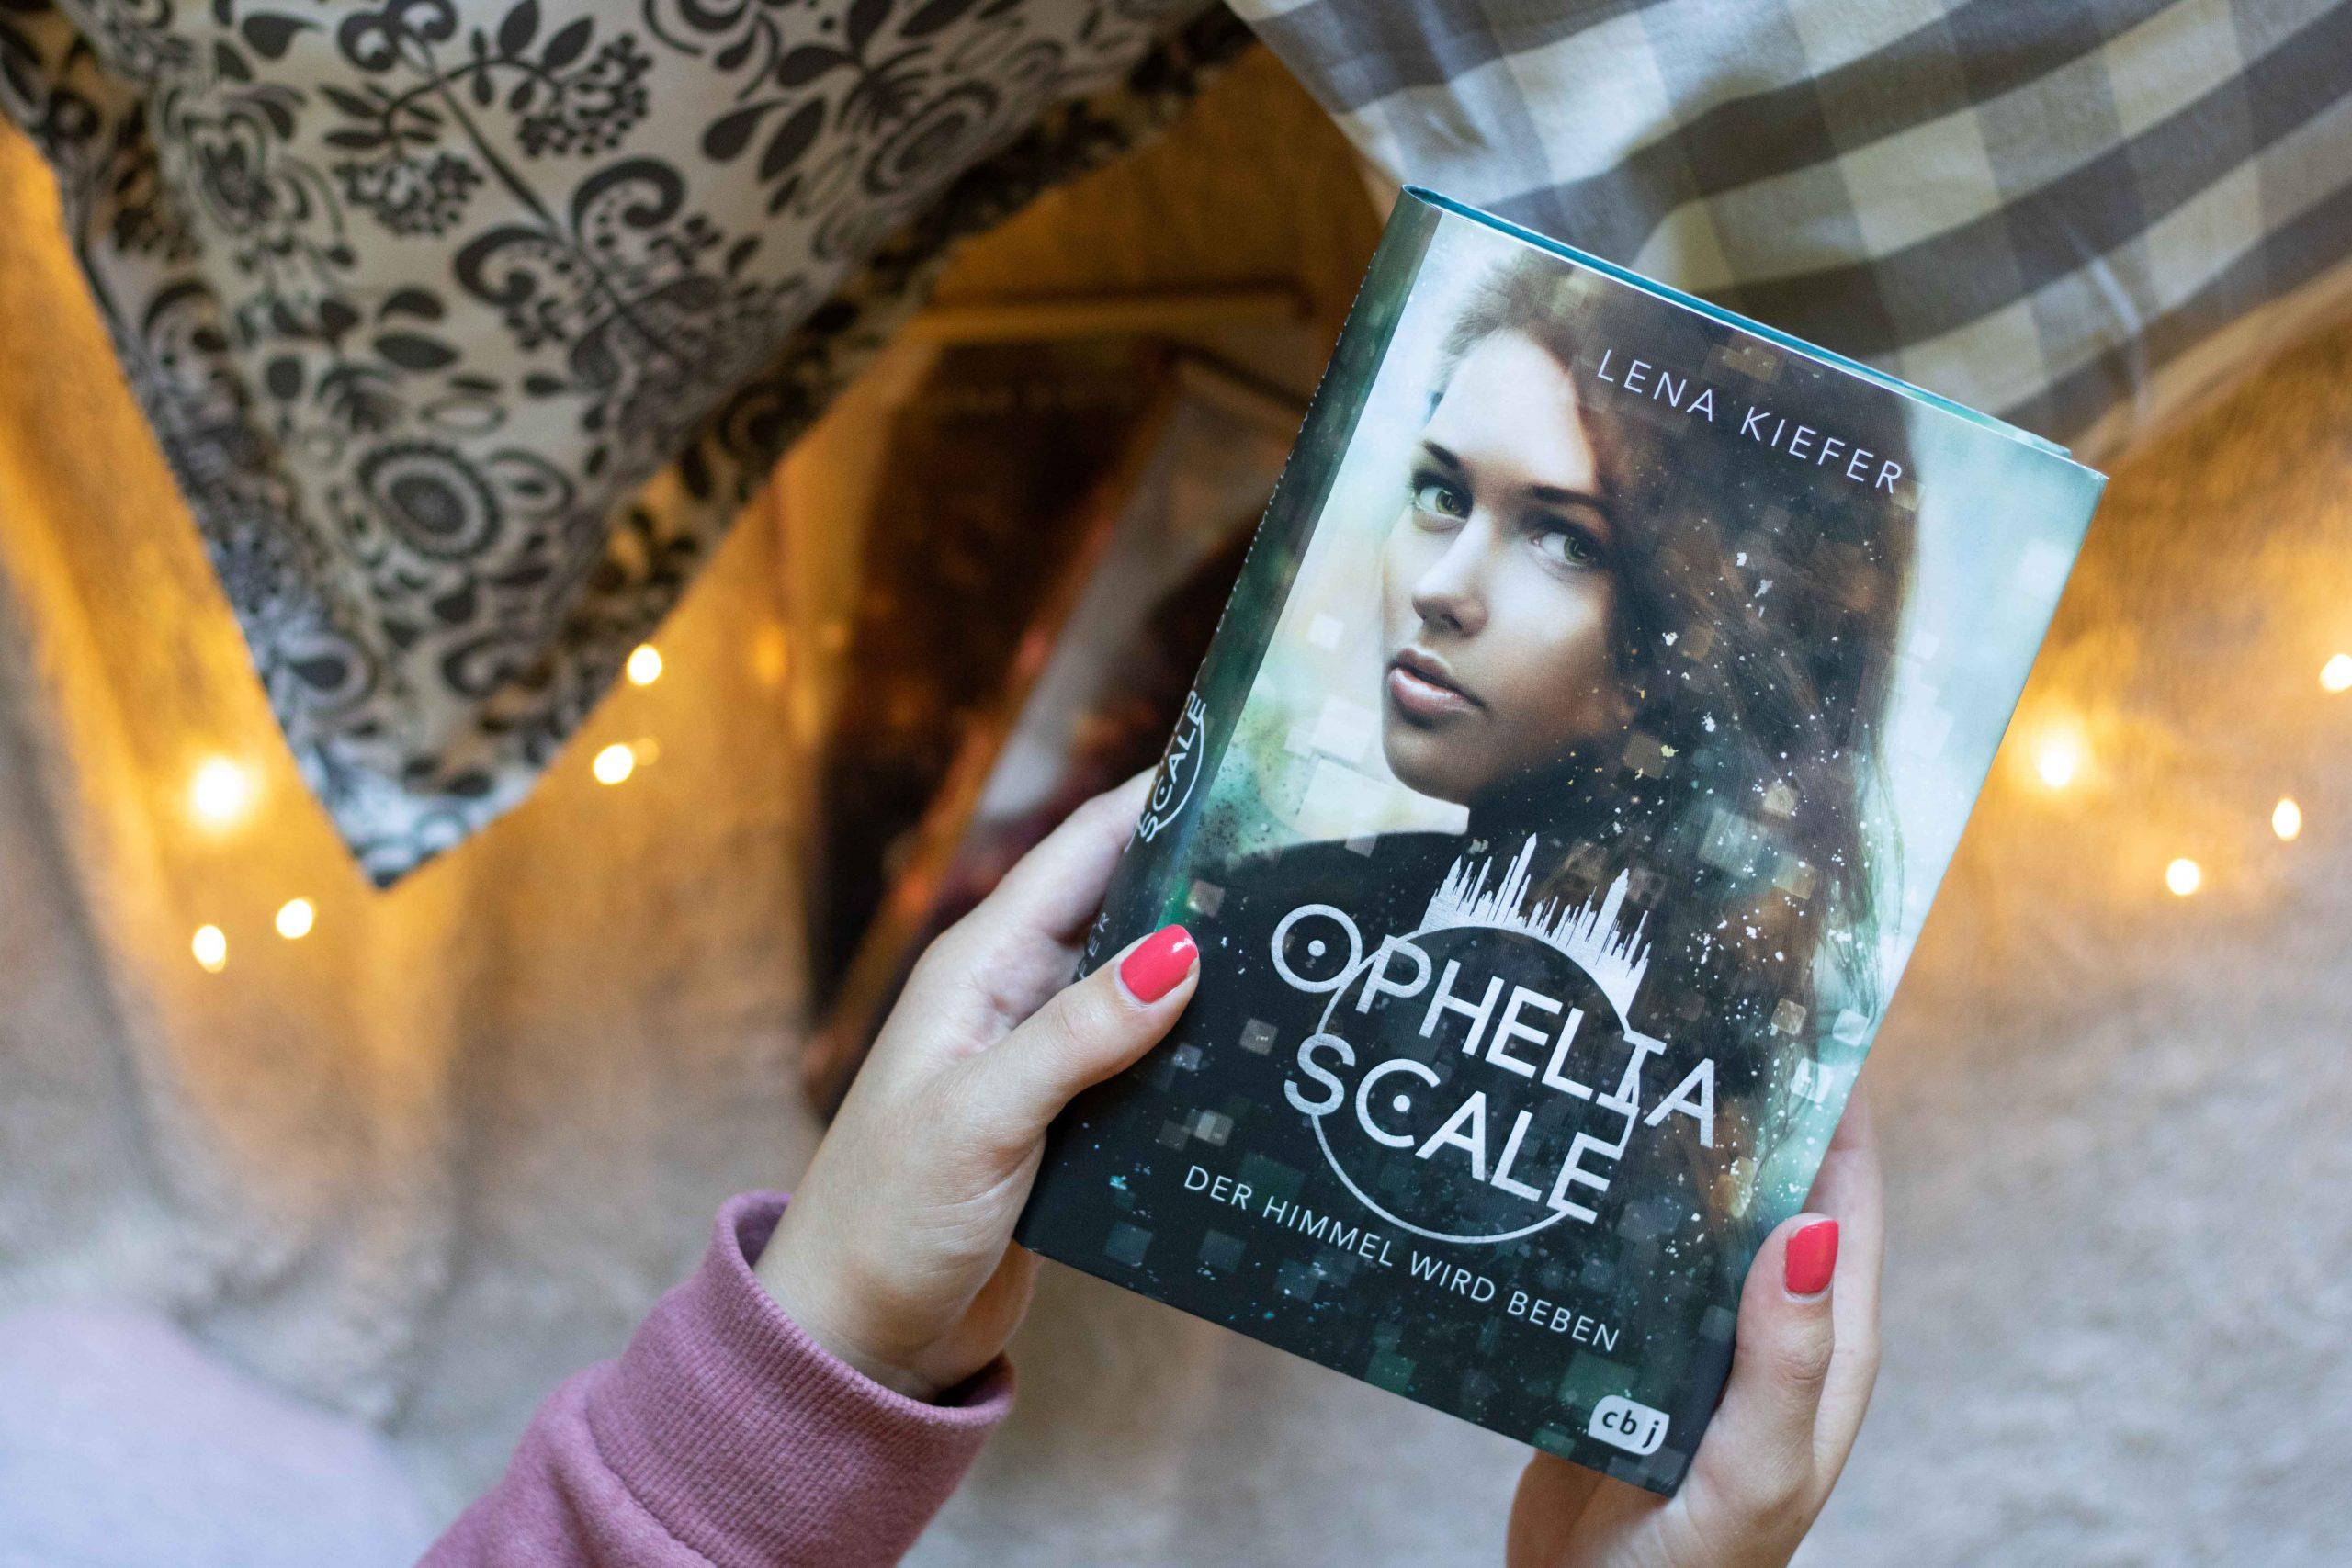 Ophelia Scale – Der Himmel wird beben | Lena Kiefer